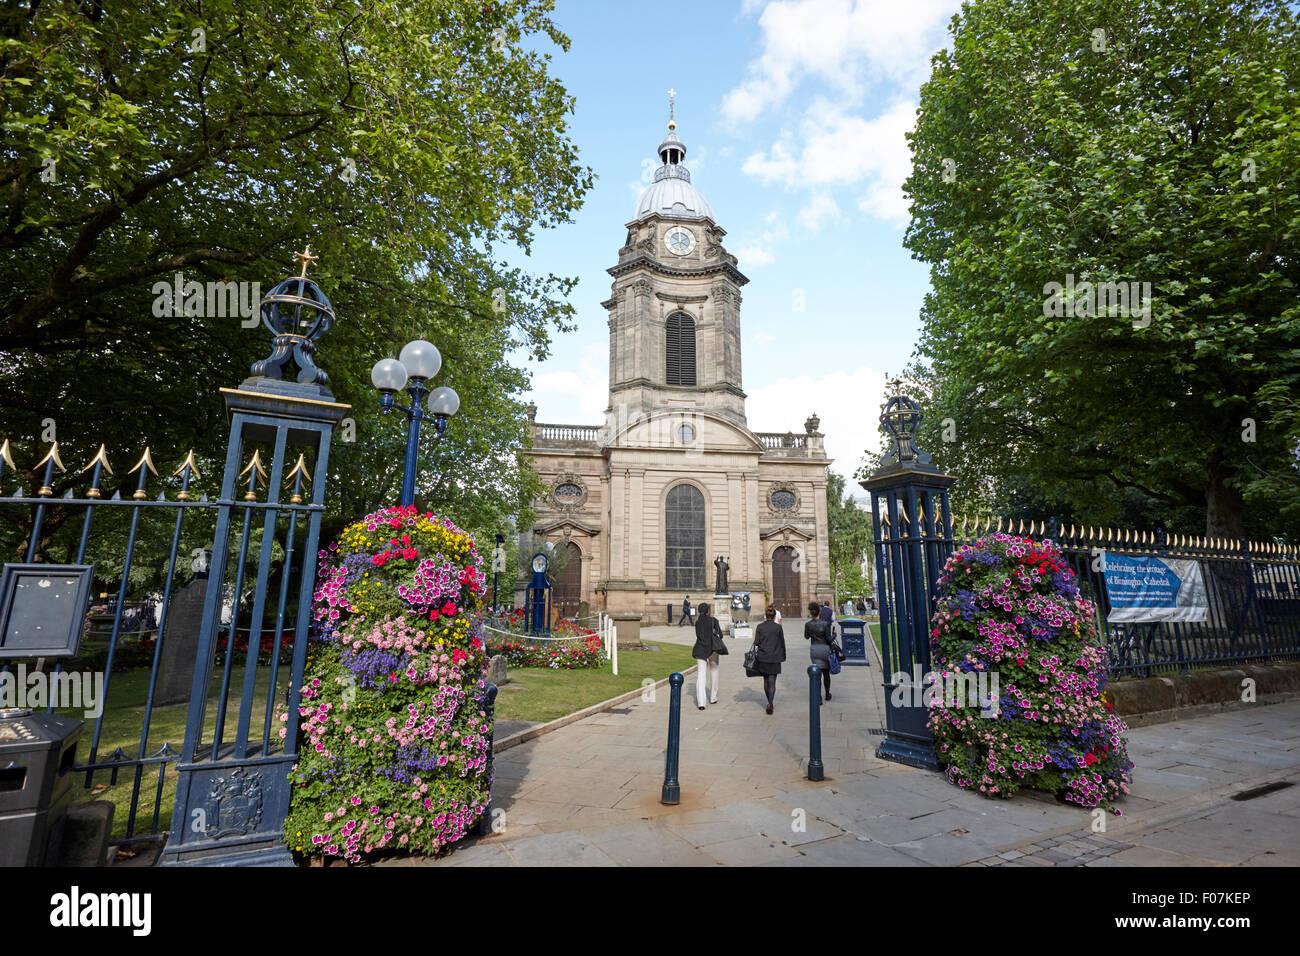 st philips Birmingham cathedral UK - Stock Image